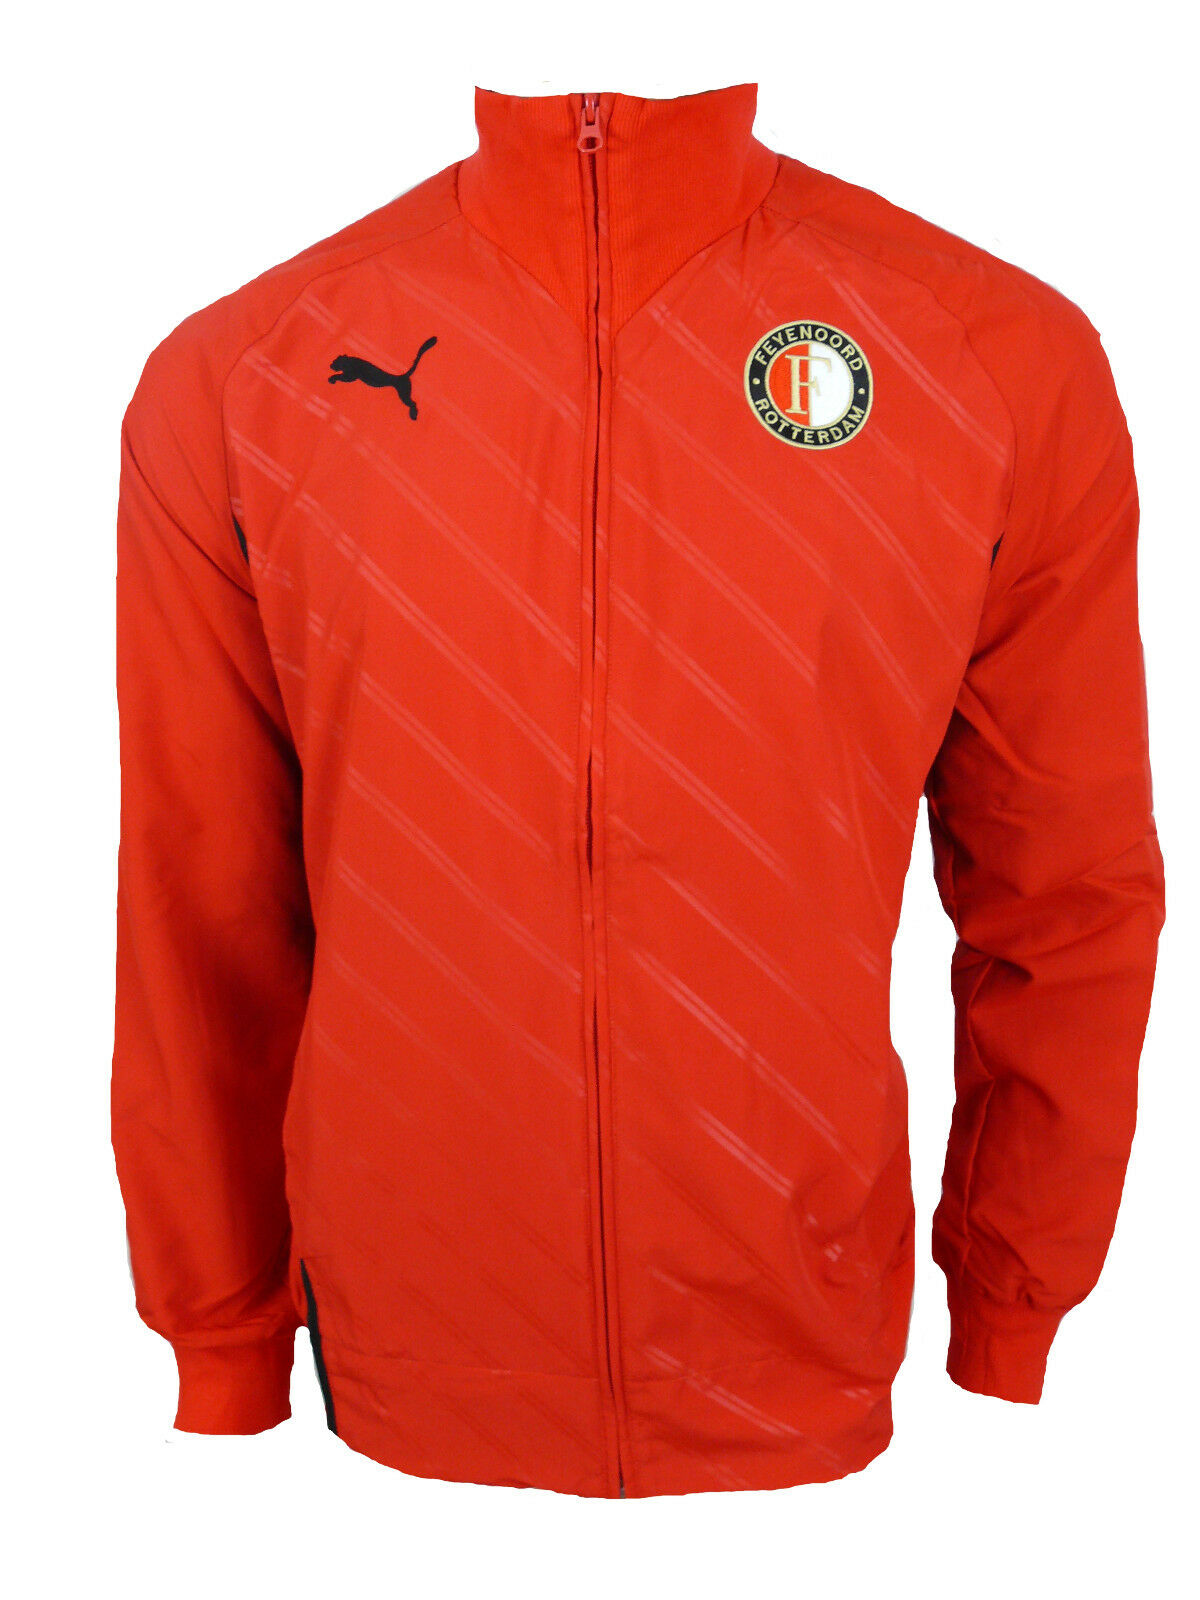 Puma Feyenoord redterdam Veste Sweat Veste GR.M